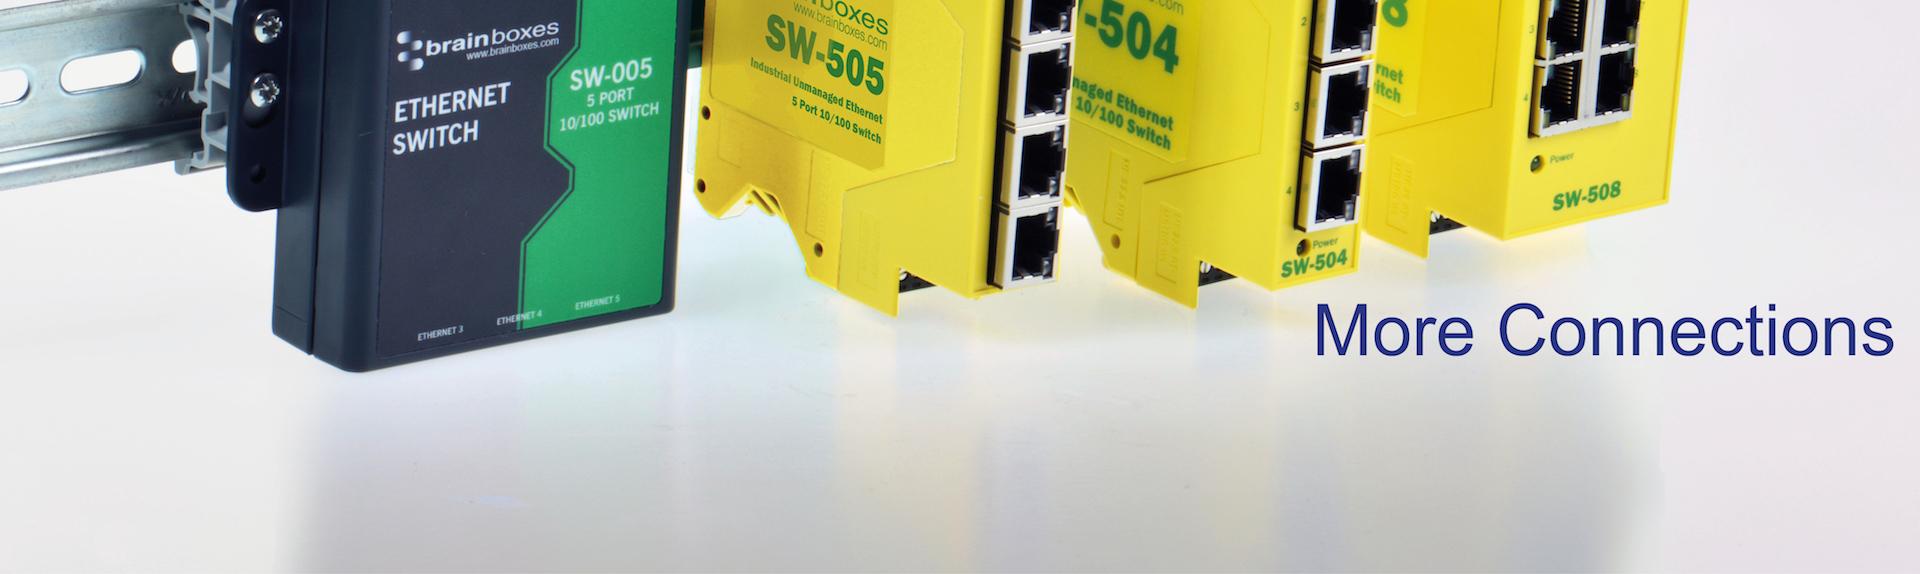 Brainboxes Industrial Ethernet Switch Range